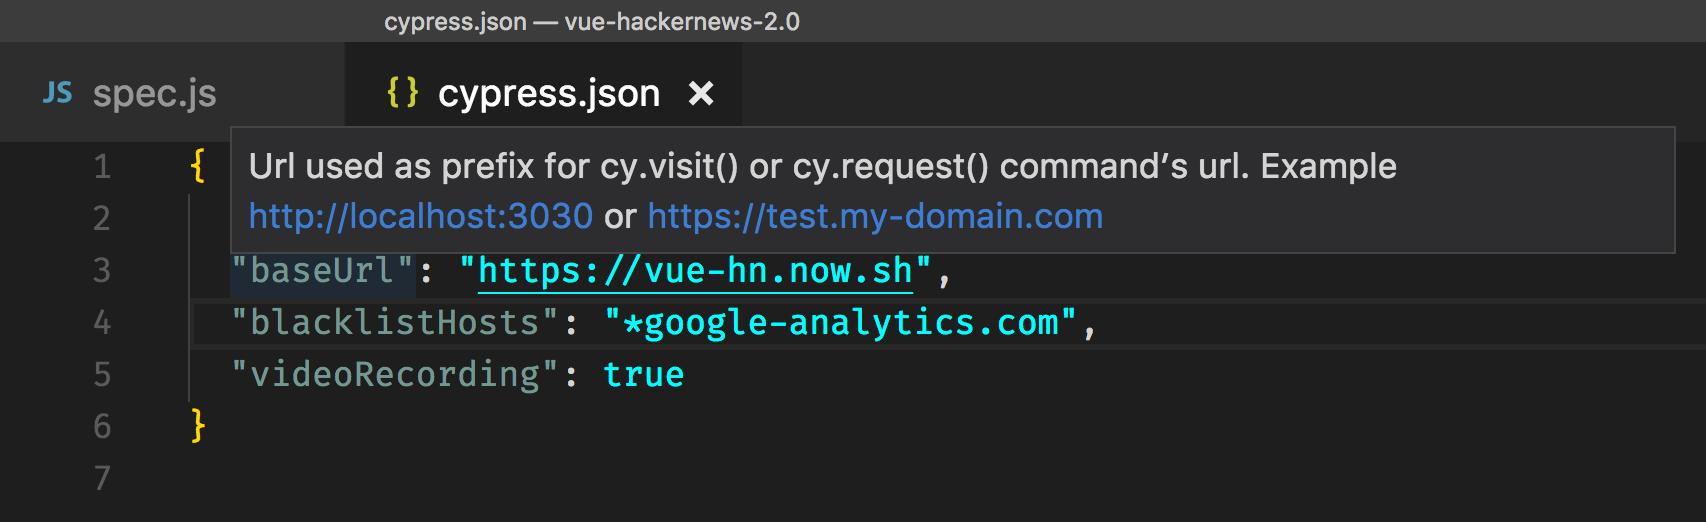 End-To-End Testing A VueJS HackerNews Clone - Vue js Developers